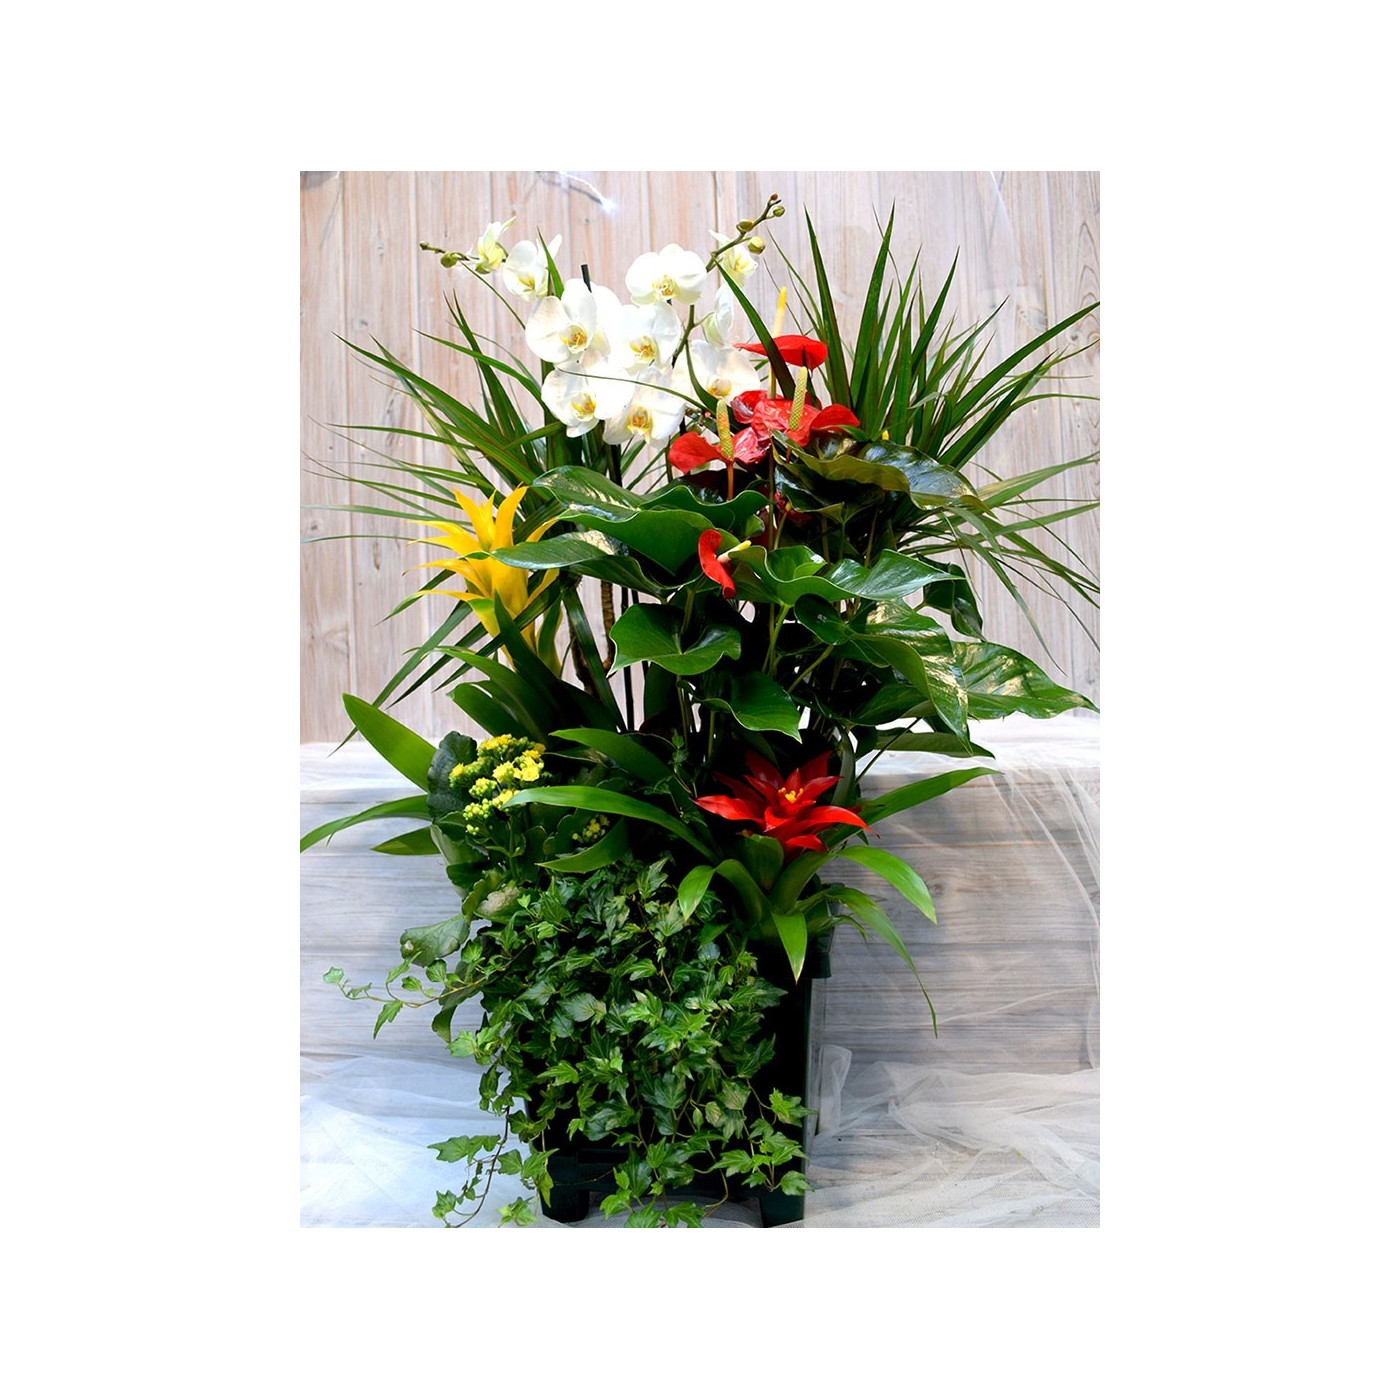 Base cuadrada con anthurium,Phaleanopsis, guzmania, kalanchoe